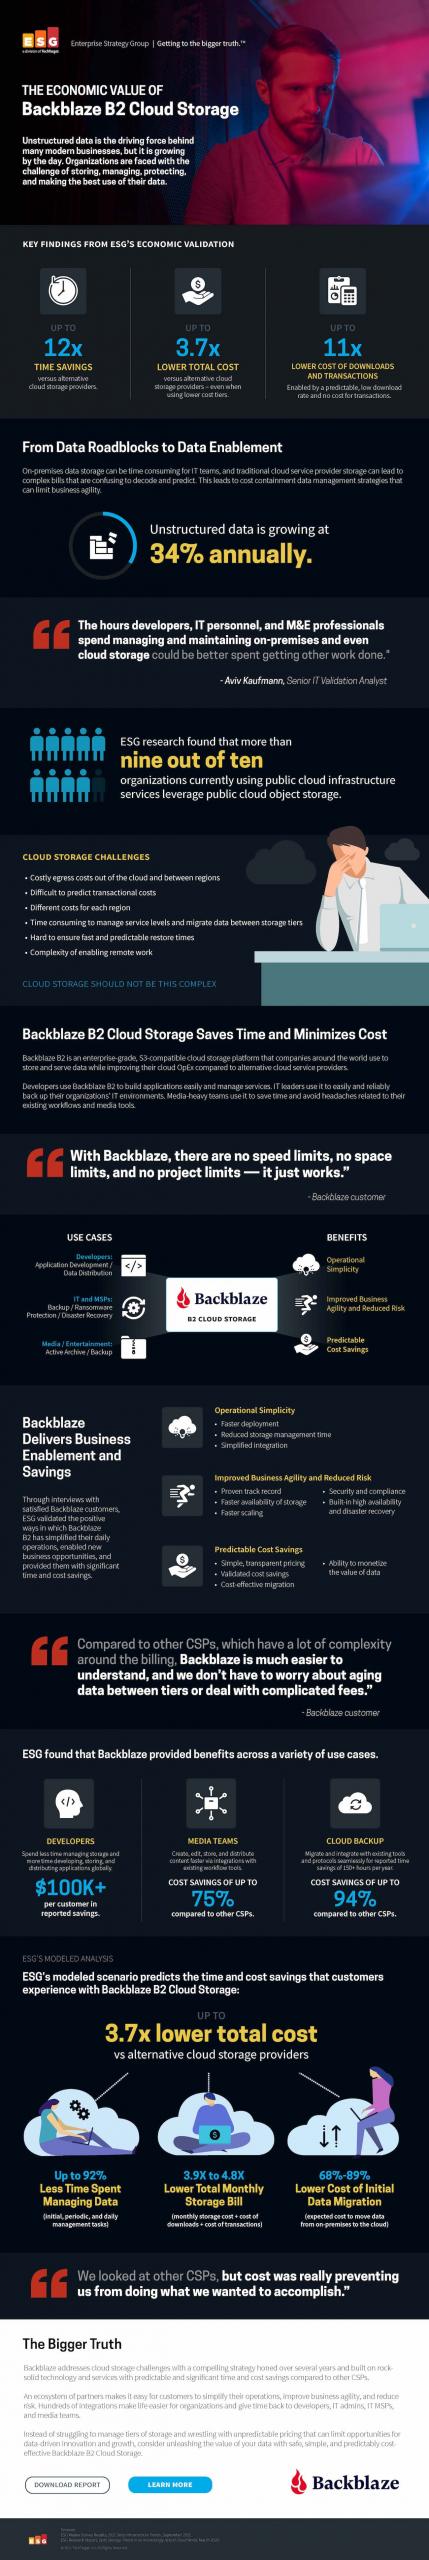 The Economic Value of Backblaze B2 Cloud Storage